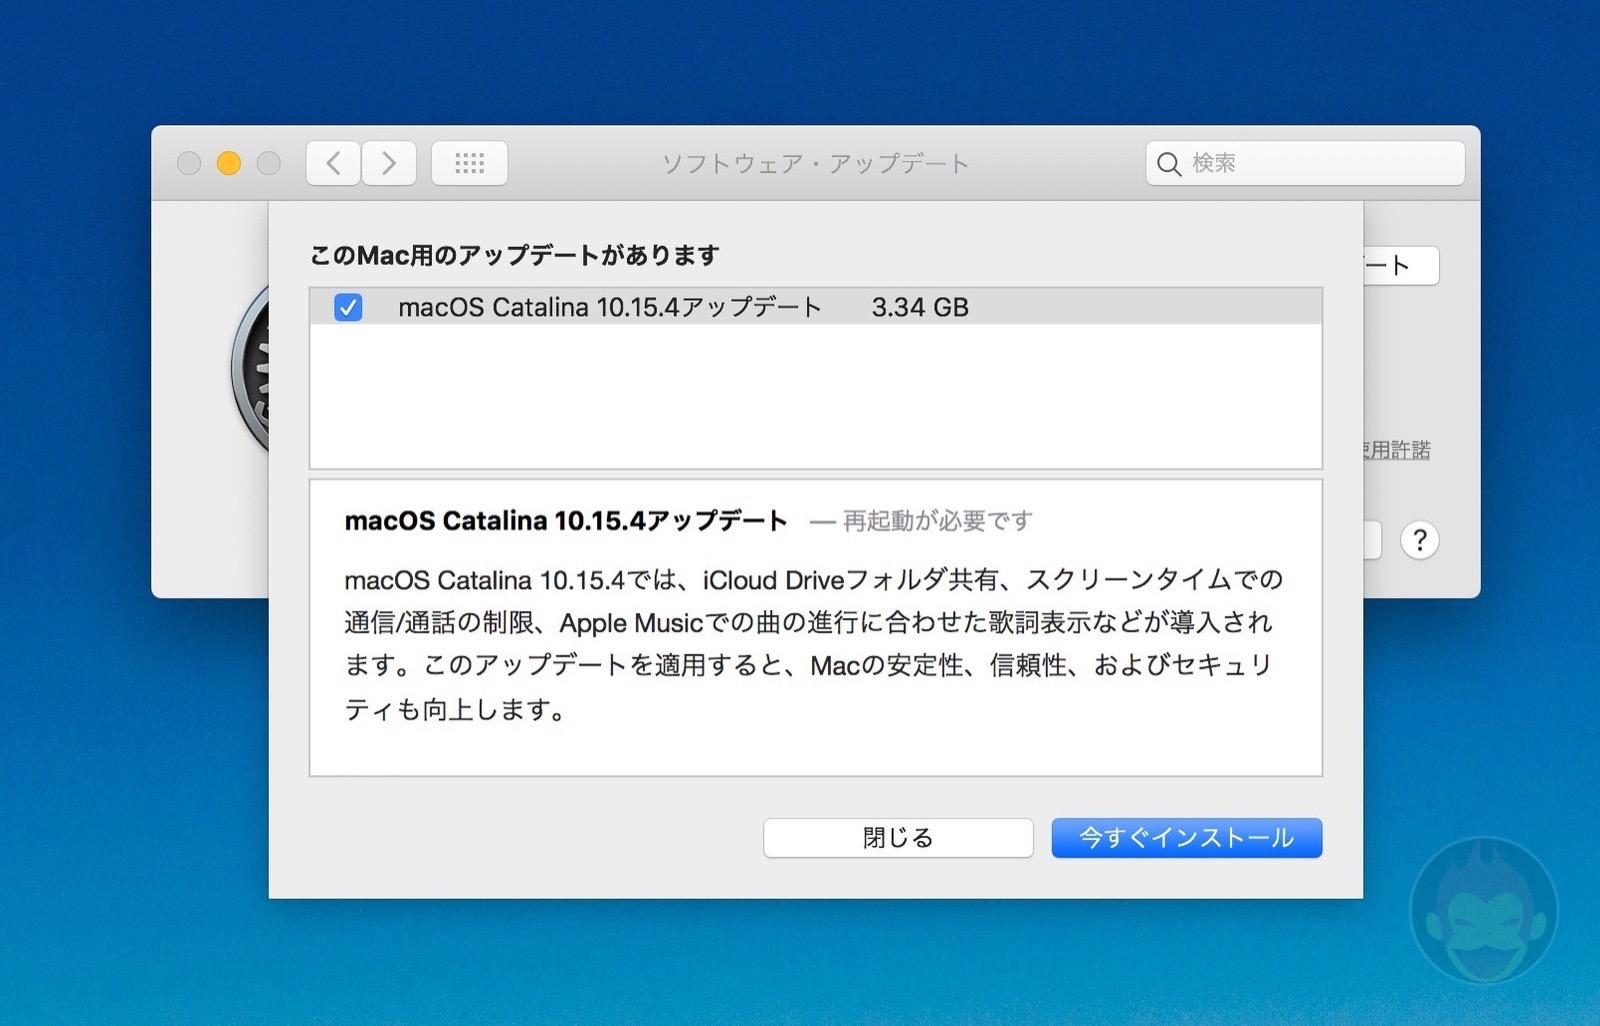 MacOS catalina 10 15 4 update 01